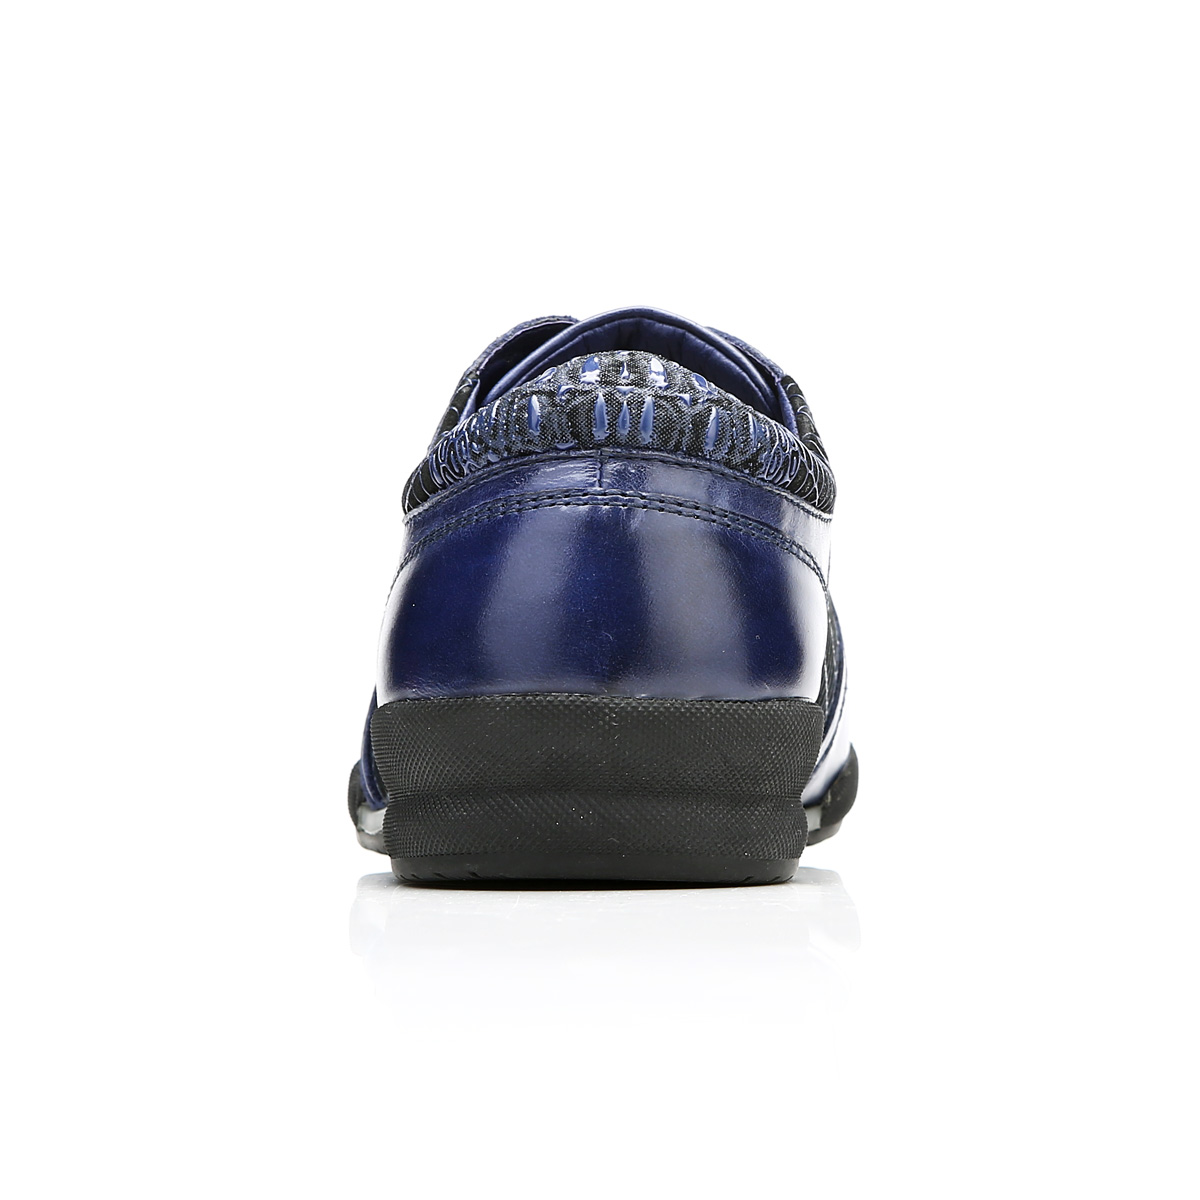 Giày da nam Olunpo QHT1425 sang trọng